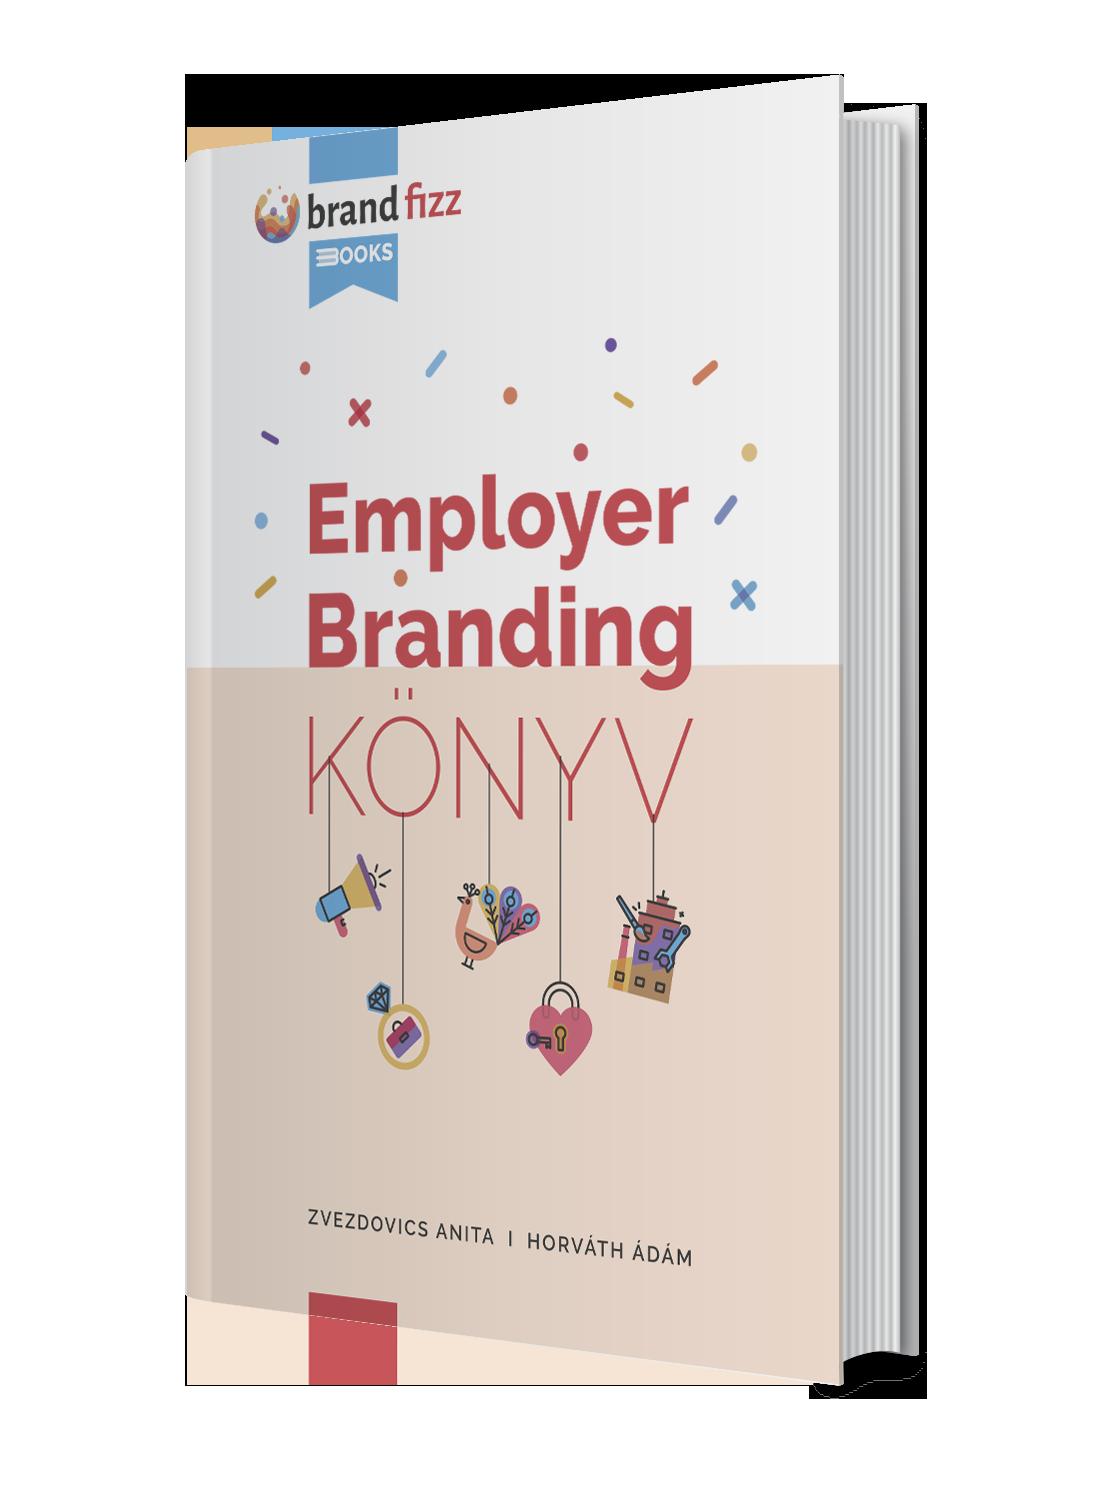 Brandfizz EB Könyv